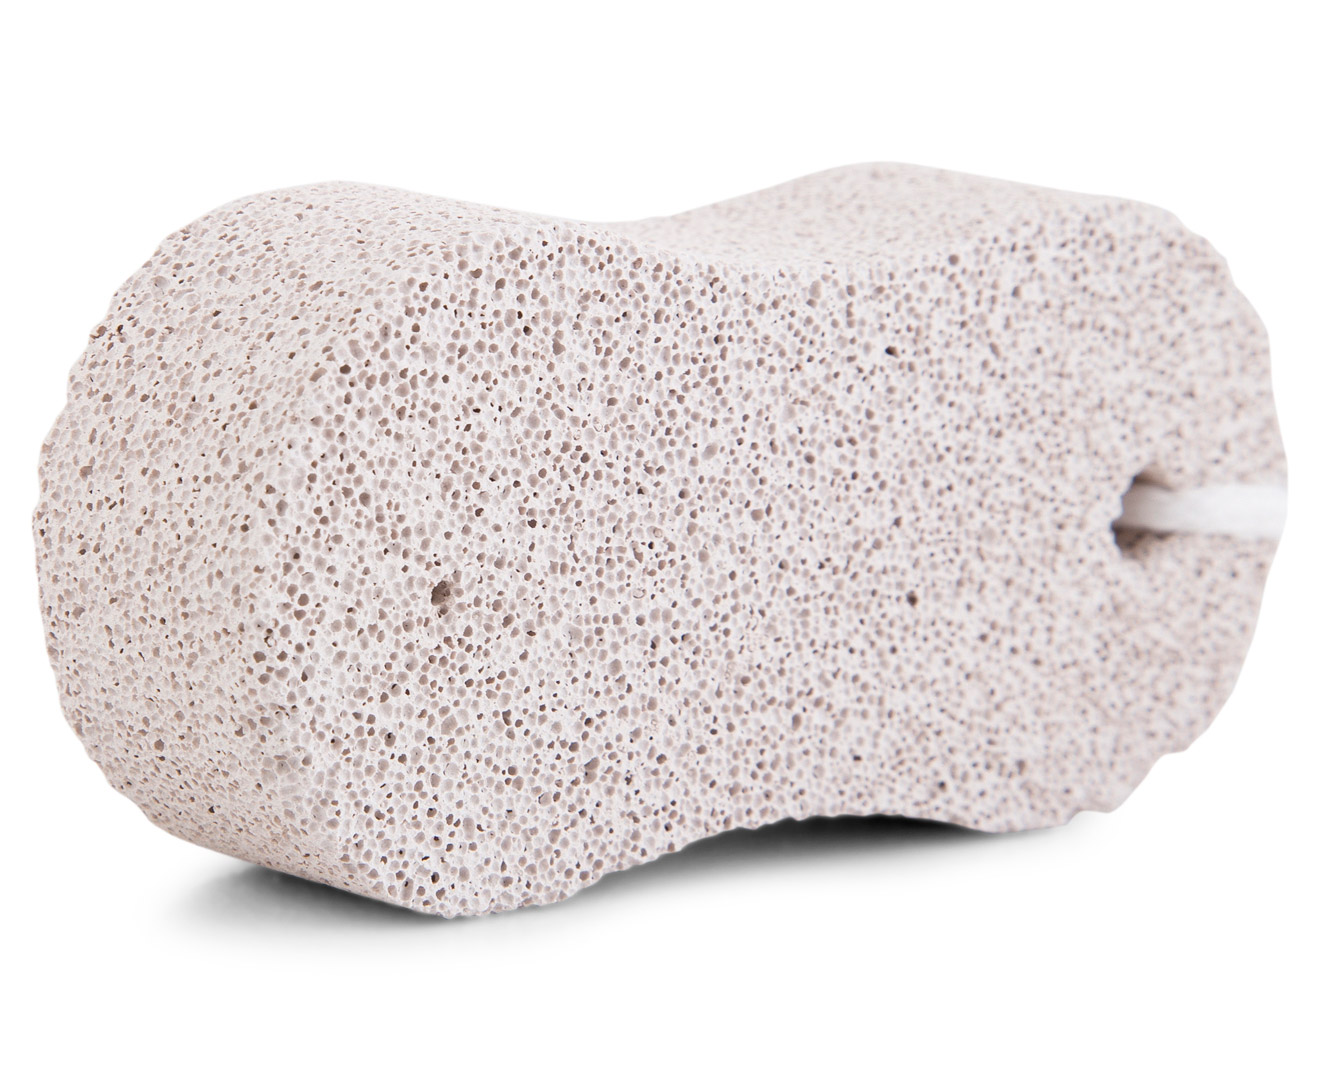 Natural Pumice Stone Australia